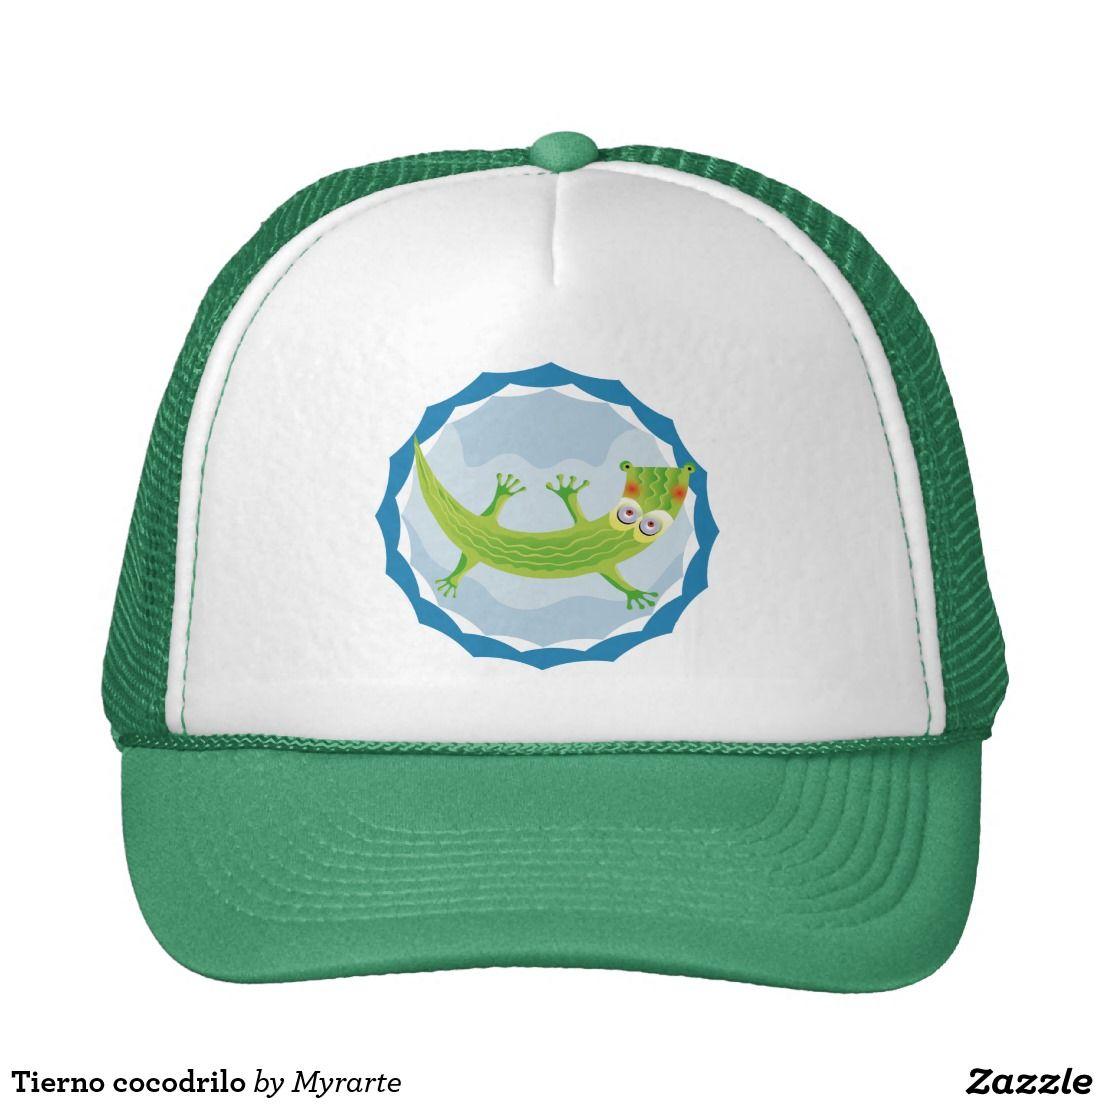 Tierno cocodrilo trucker hat. Producto disponible en tienda Zazzle. Accesorios, moda. Product available in Zazzle store. Fashion Accessories. Regalos, Gifts. Link to product: http://www.zazzle.com/tierno_cocodrilo_trucker_hat-148640164694309798?CMPN=shareicon&lang=en&social=true&view=113076339708907653&rf=238167879144476949 #gorra #hat #cocodrilo #crocodile